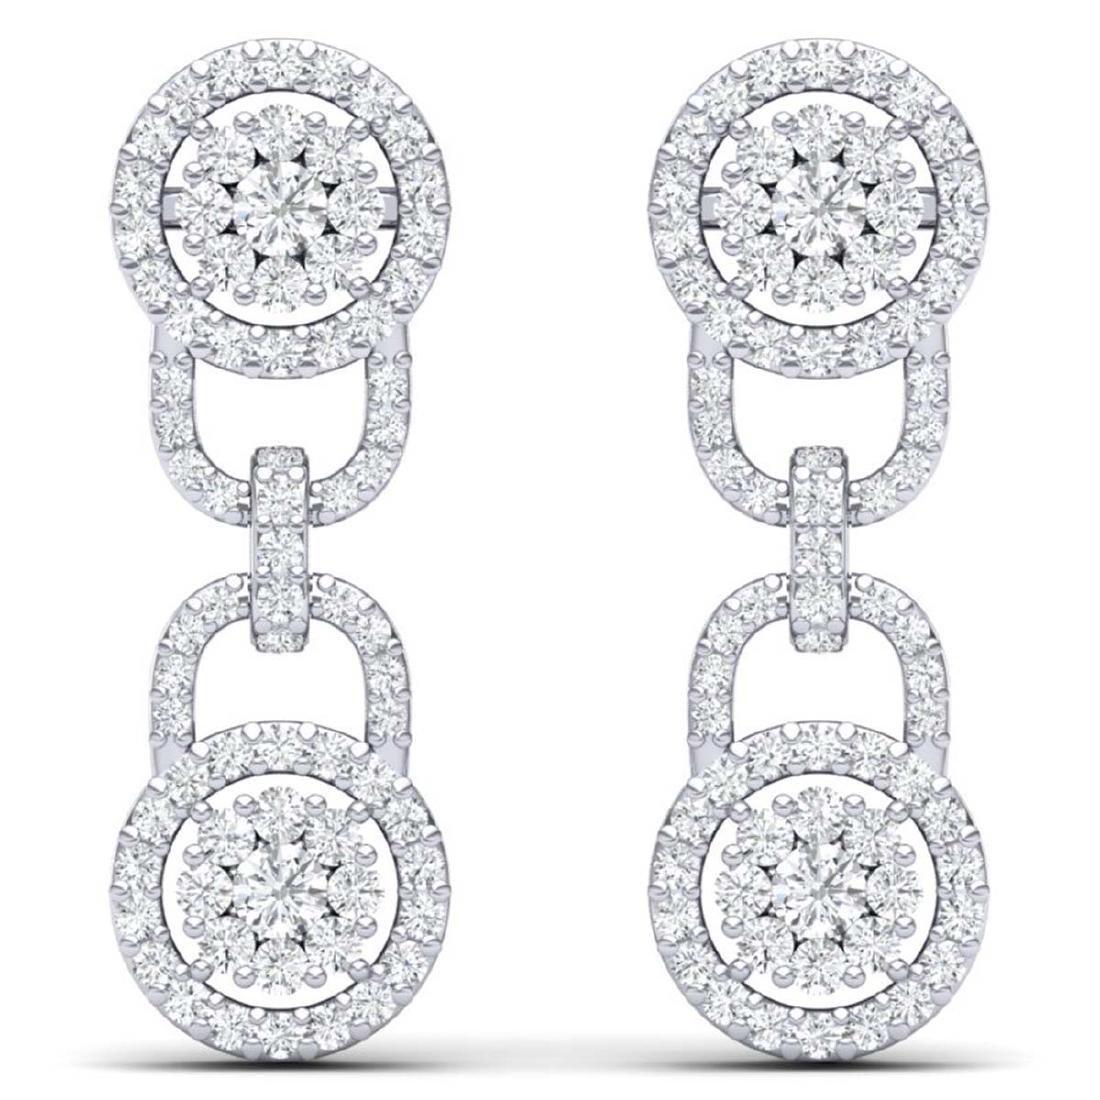 2.30 CTW Certified SI/I Diamond Halo Earrings 18K White - 3